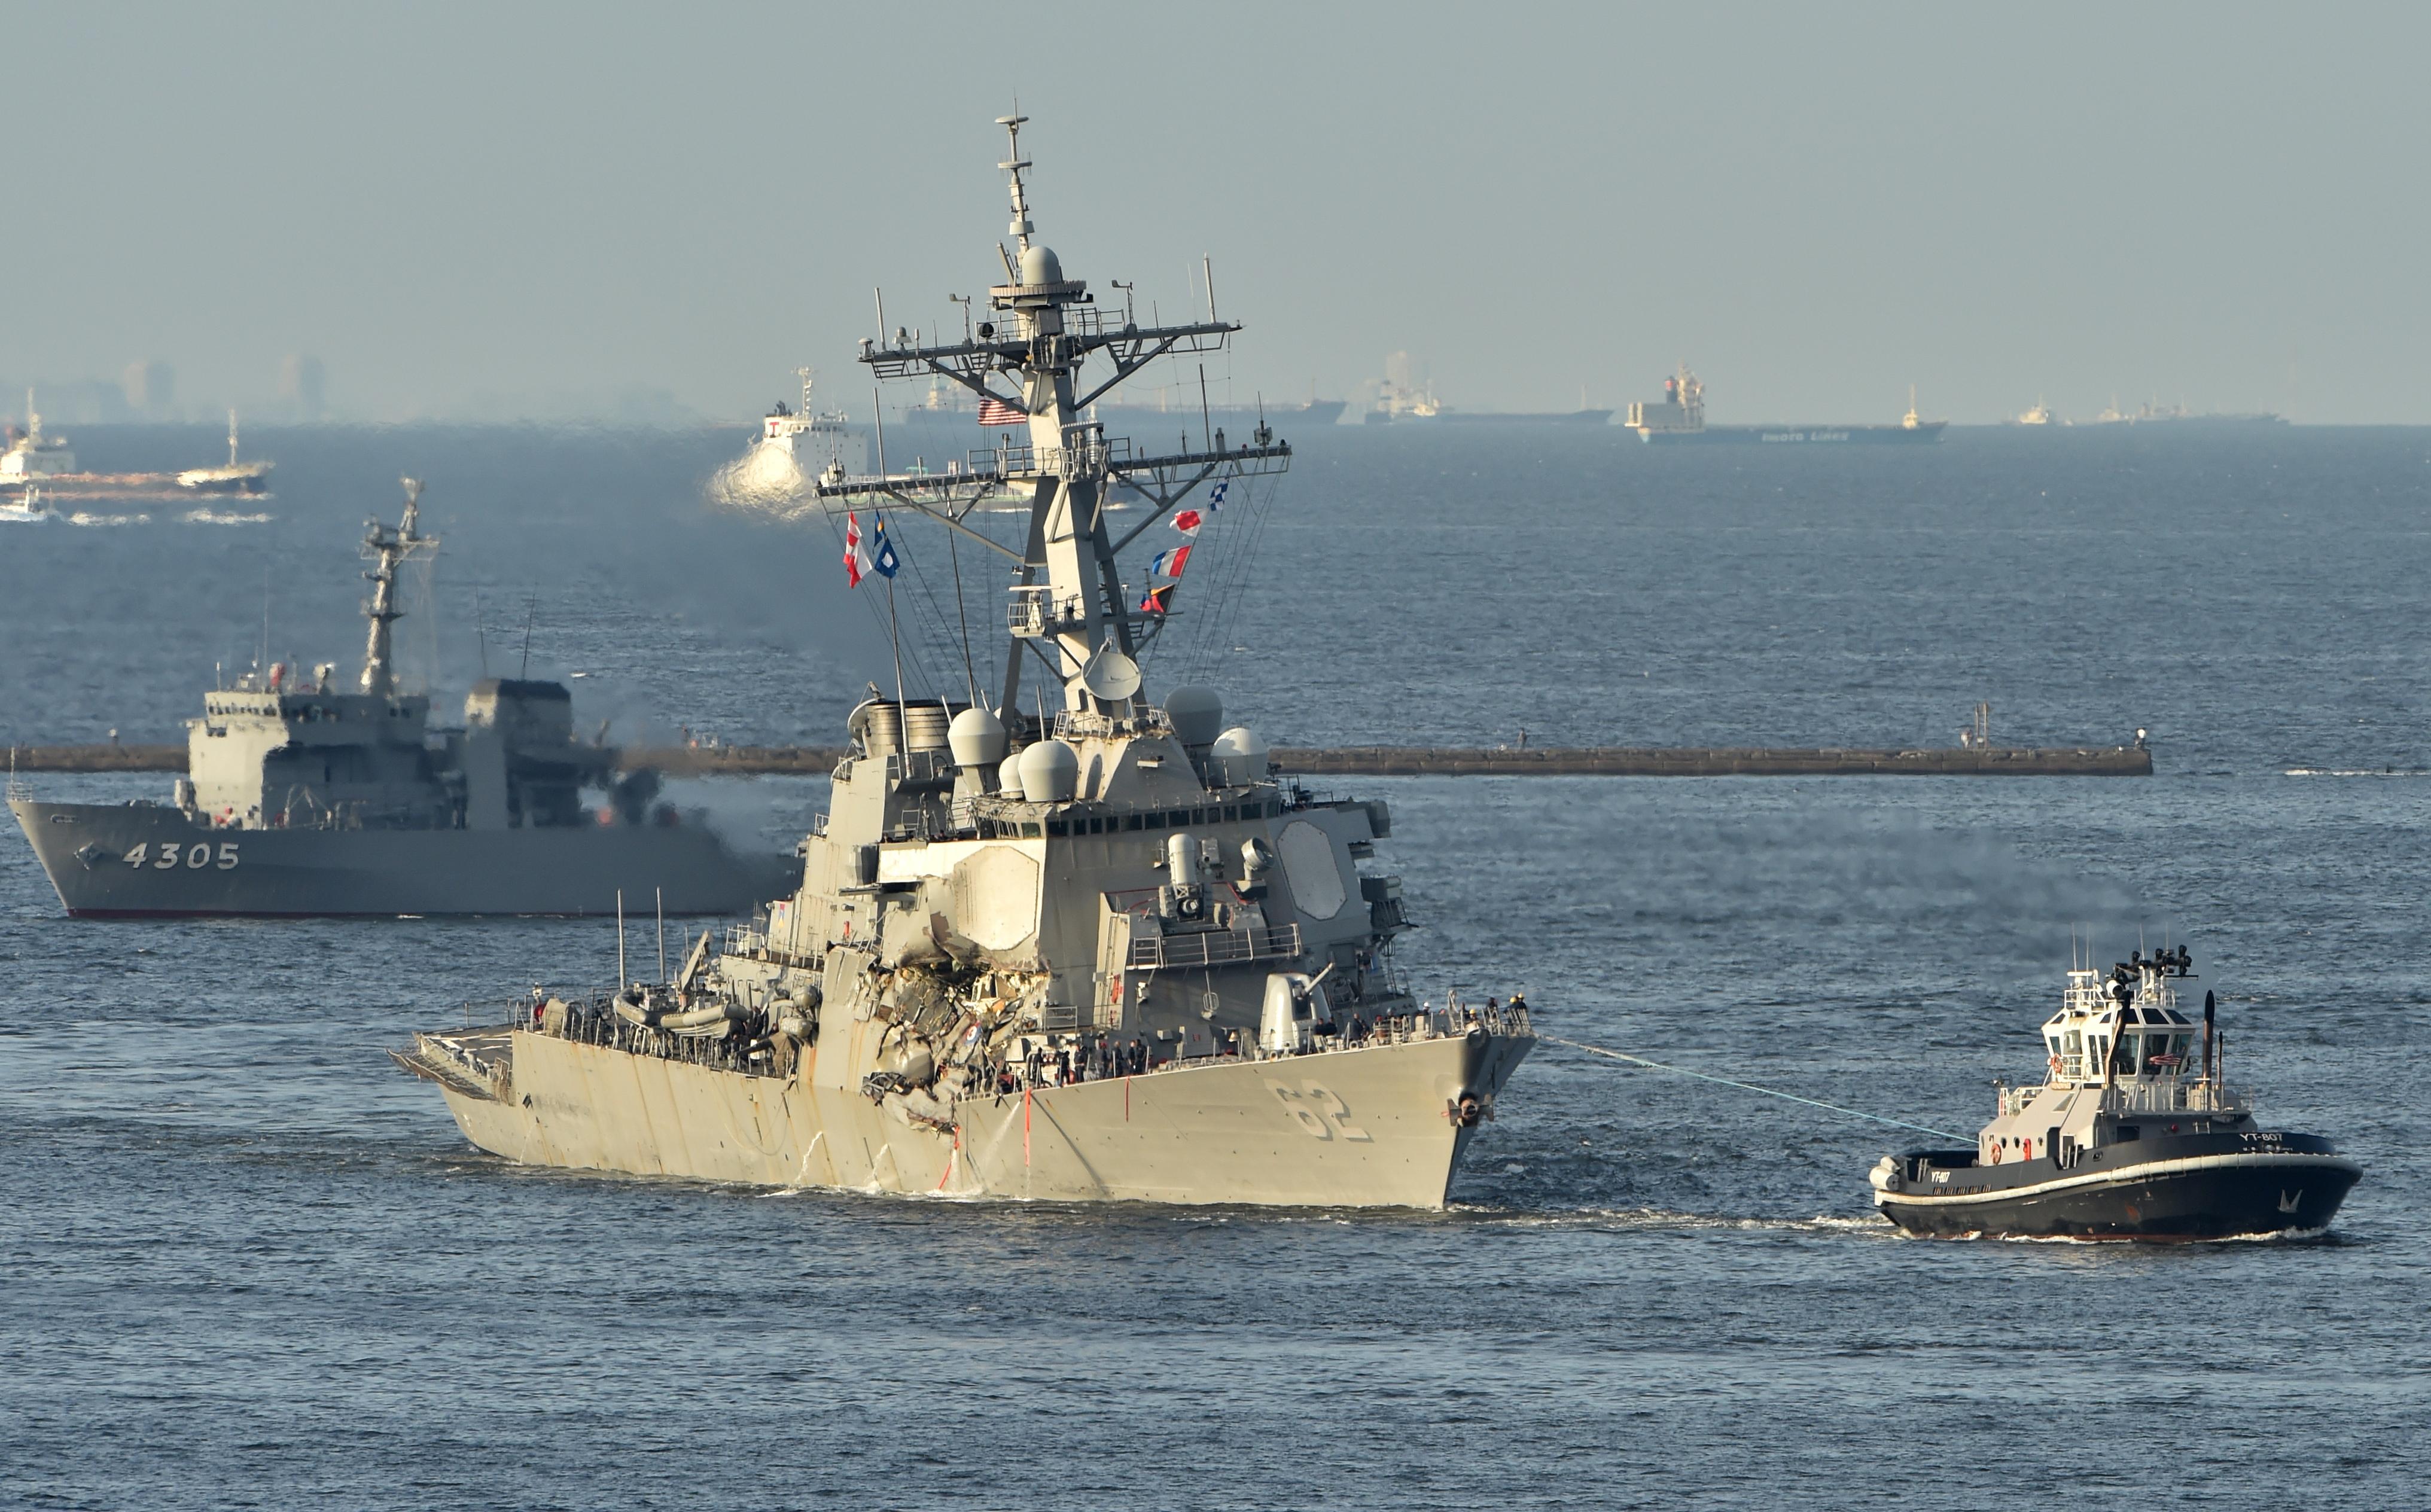 US Navy guided missile destroyer USS Fitzgerald arrives at its mother port US Naval Yokosuka Base, Kanagawa prefecture on June 17, 2017. (Kazuhiro Nogi/AFP/Getty Images)